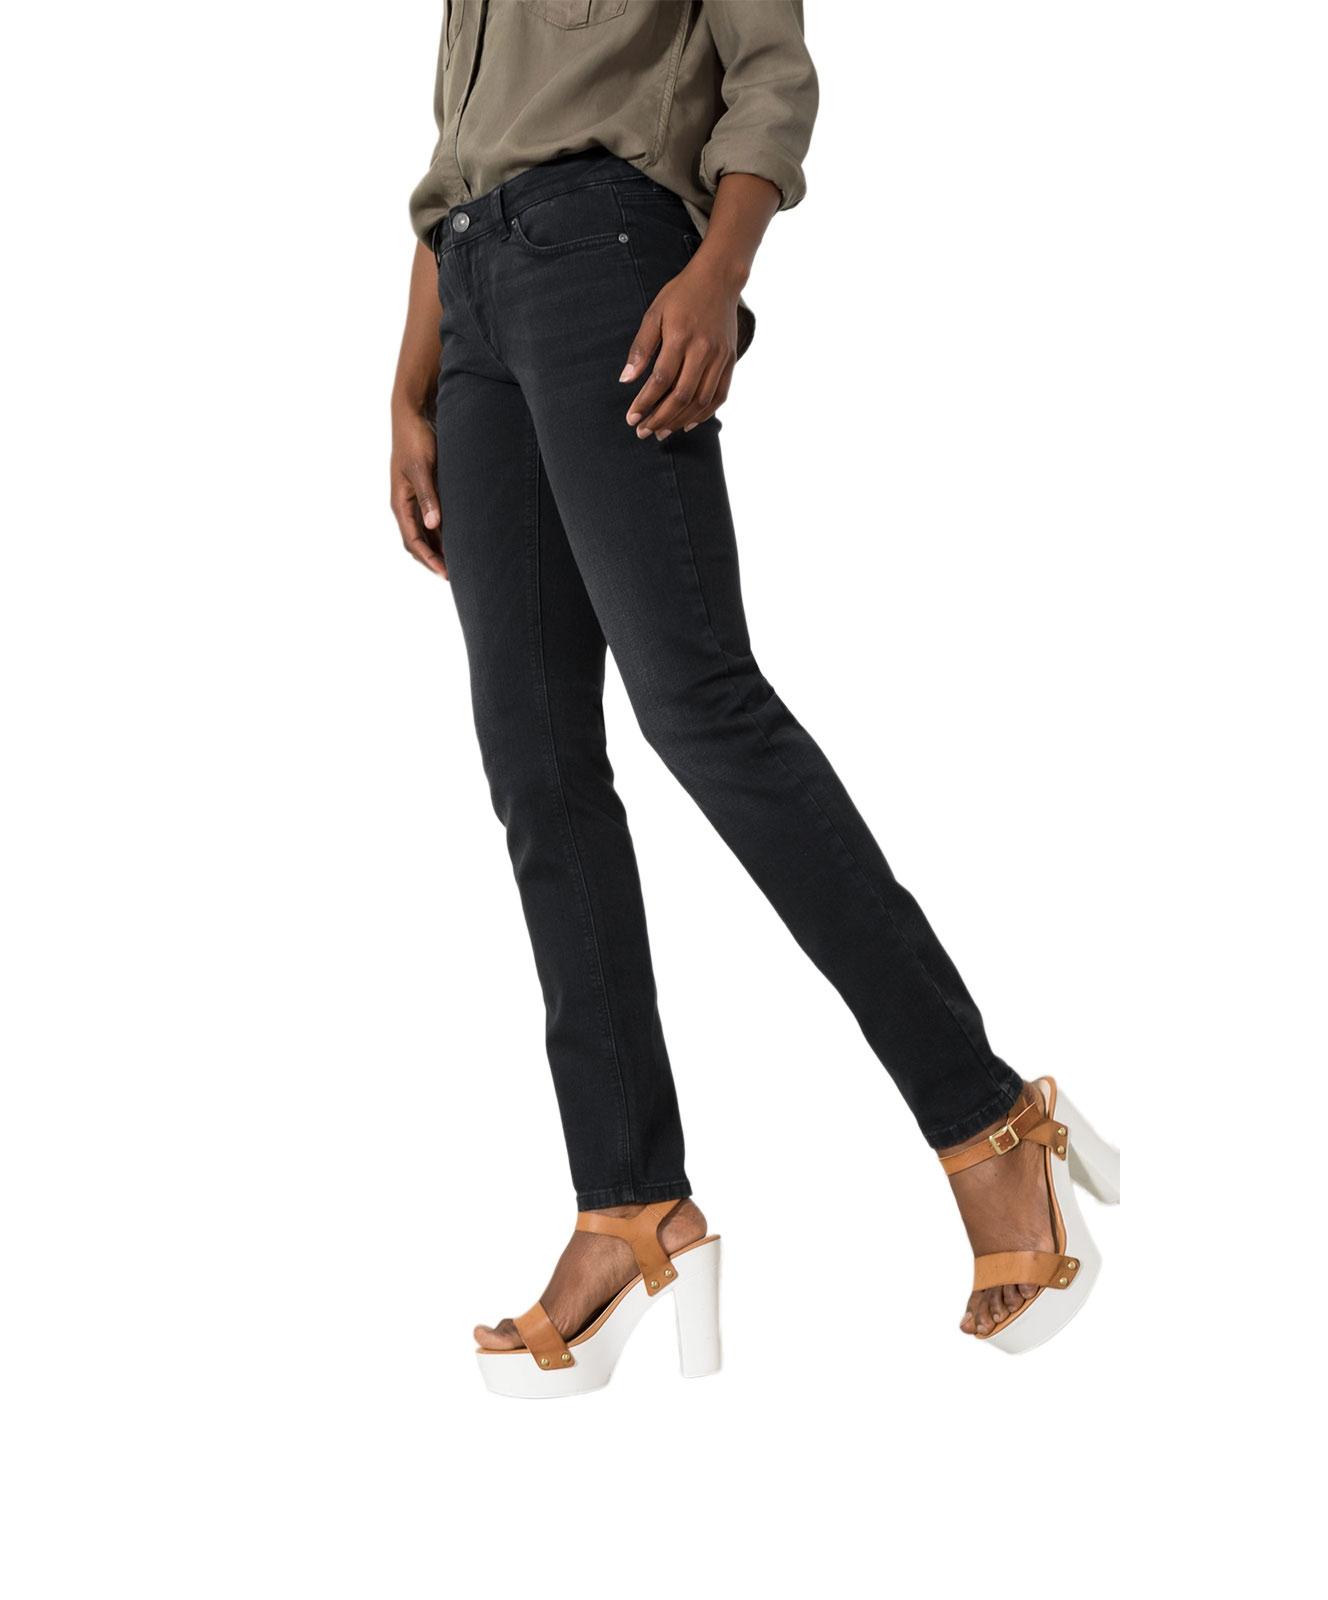 Hosen für Frauen - HIS MONROE Jeans Skinny Fit Advanced Black  - Onlineshop Jeans Meile